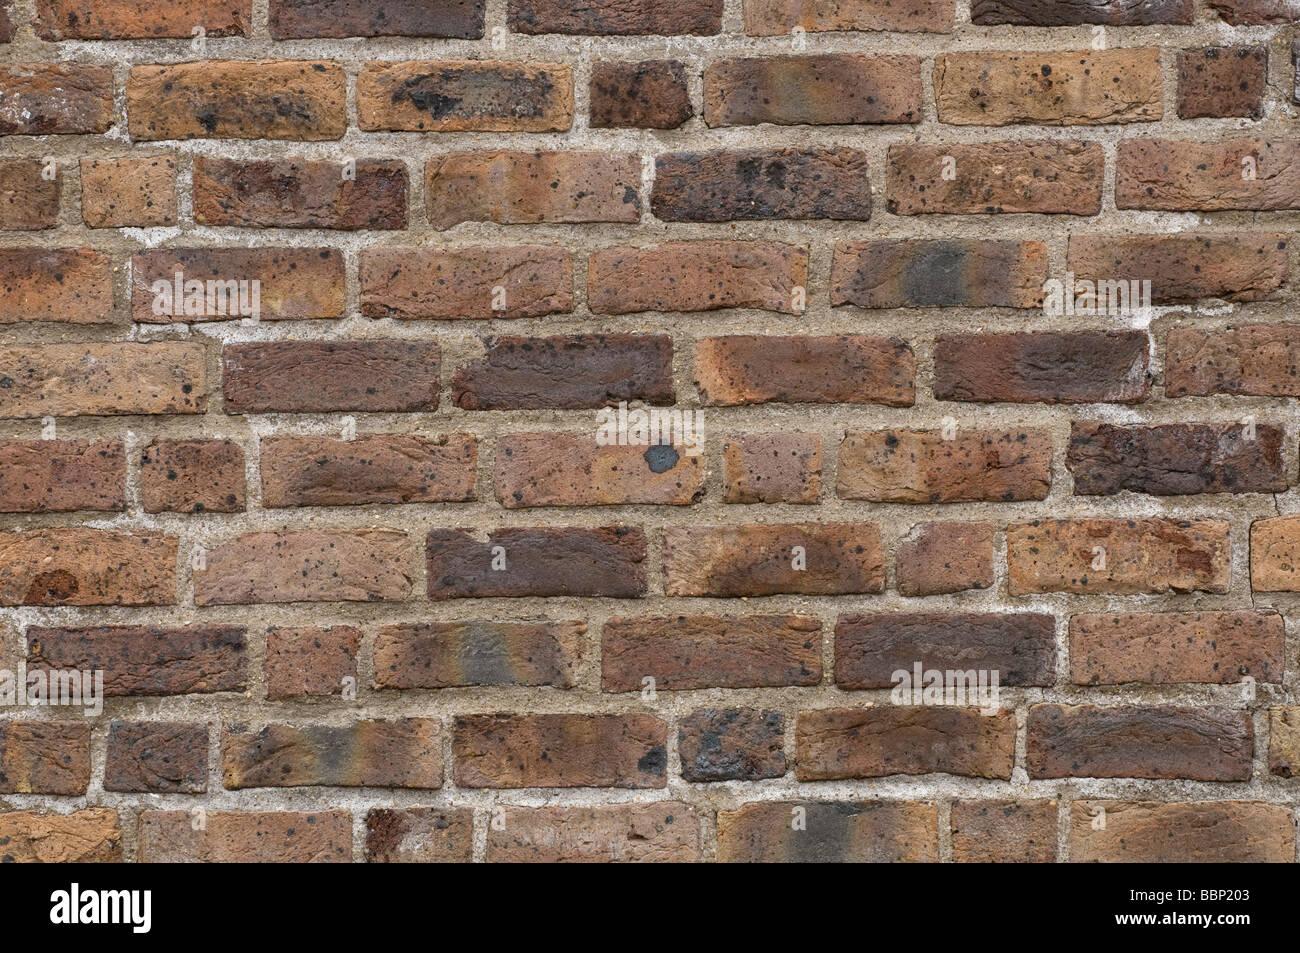 Rustic brick wall - Stock Image